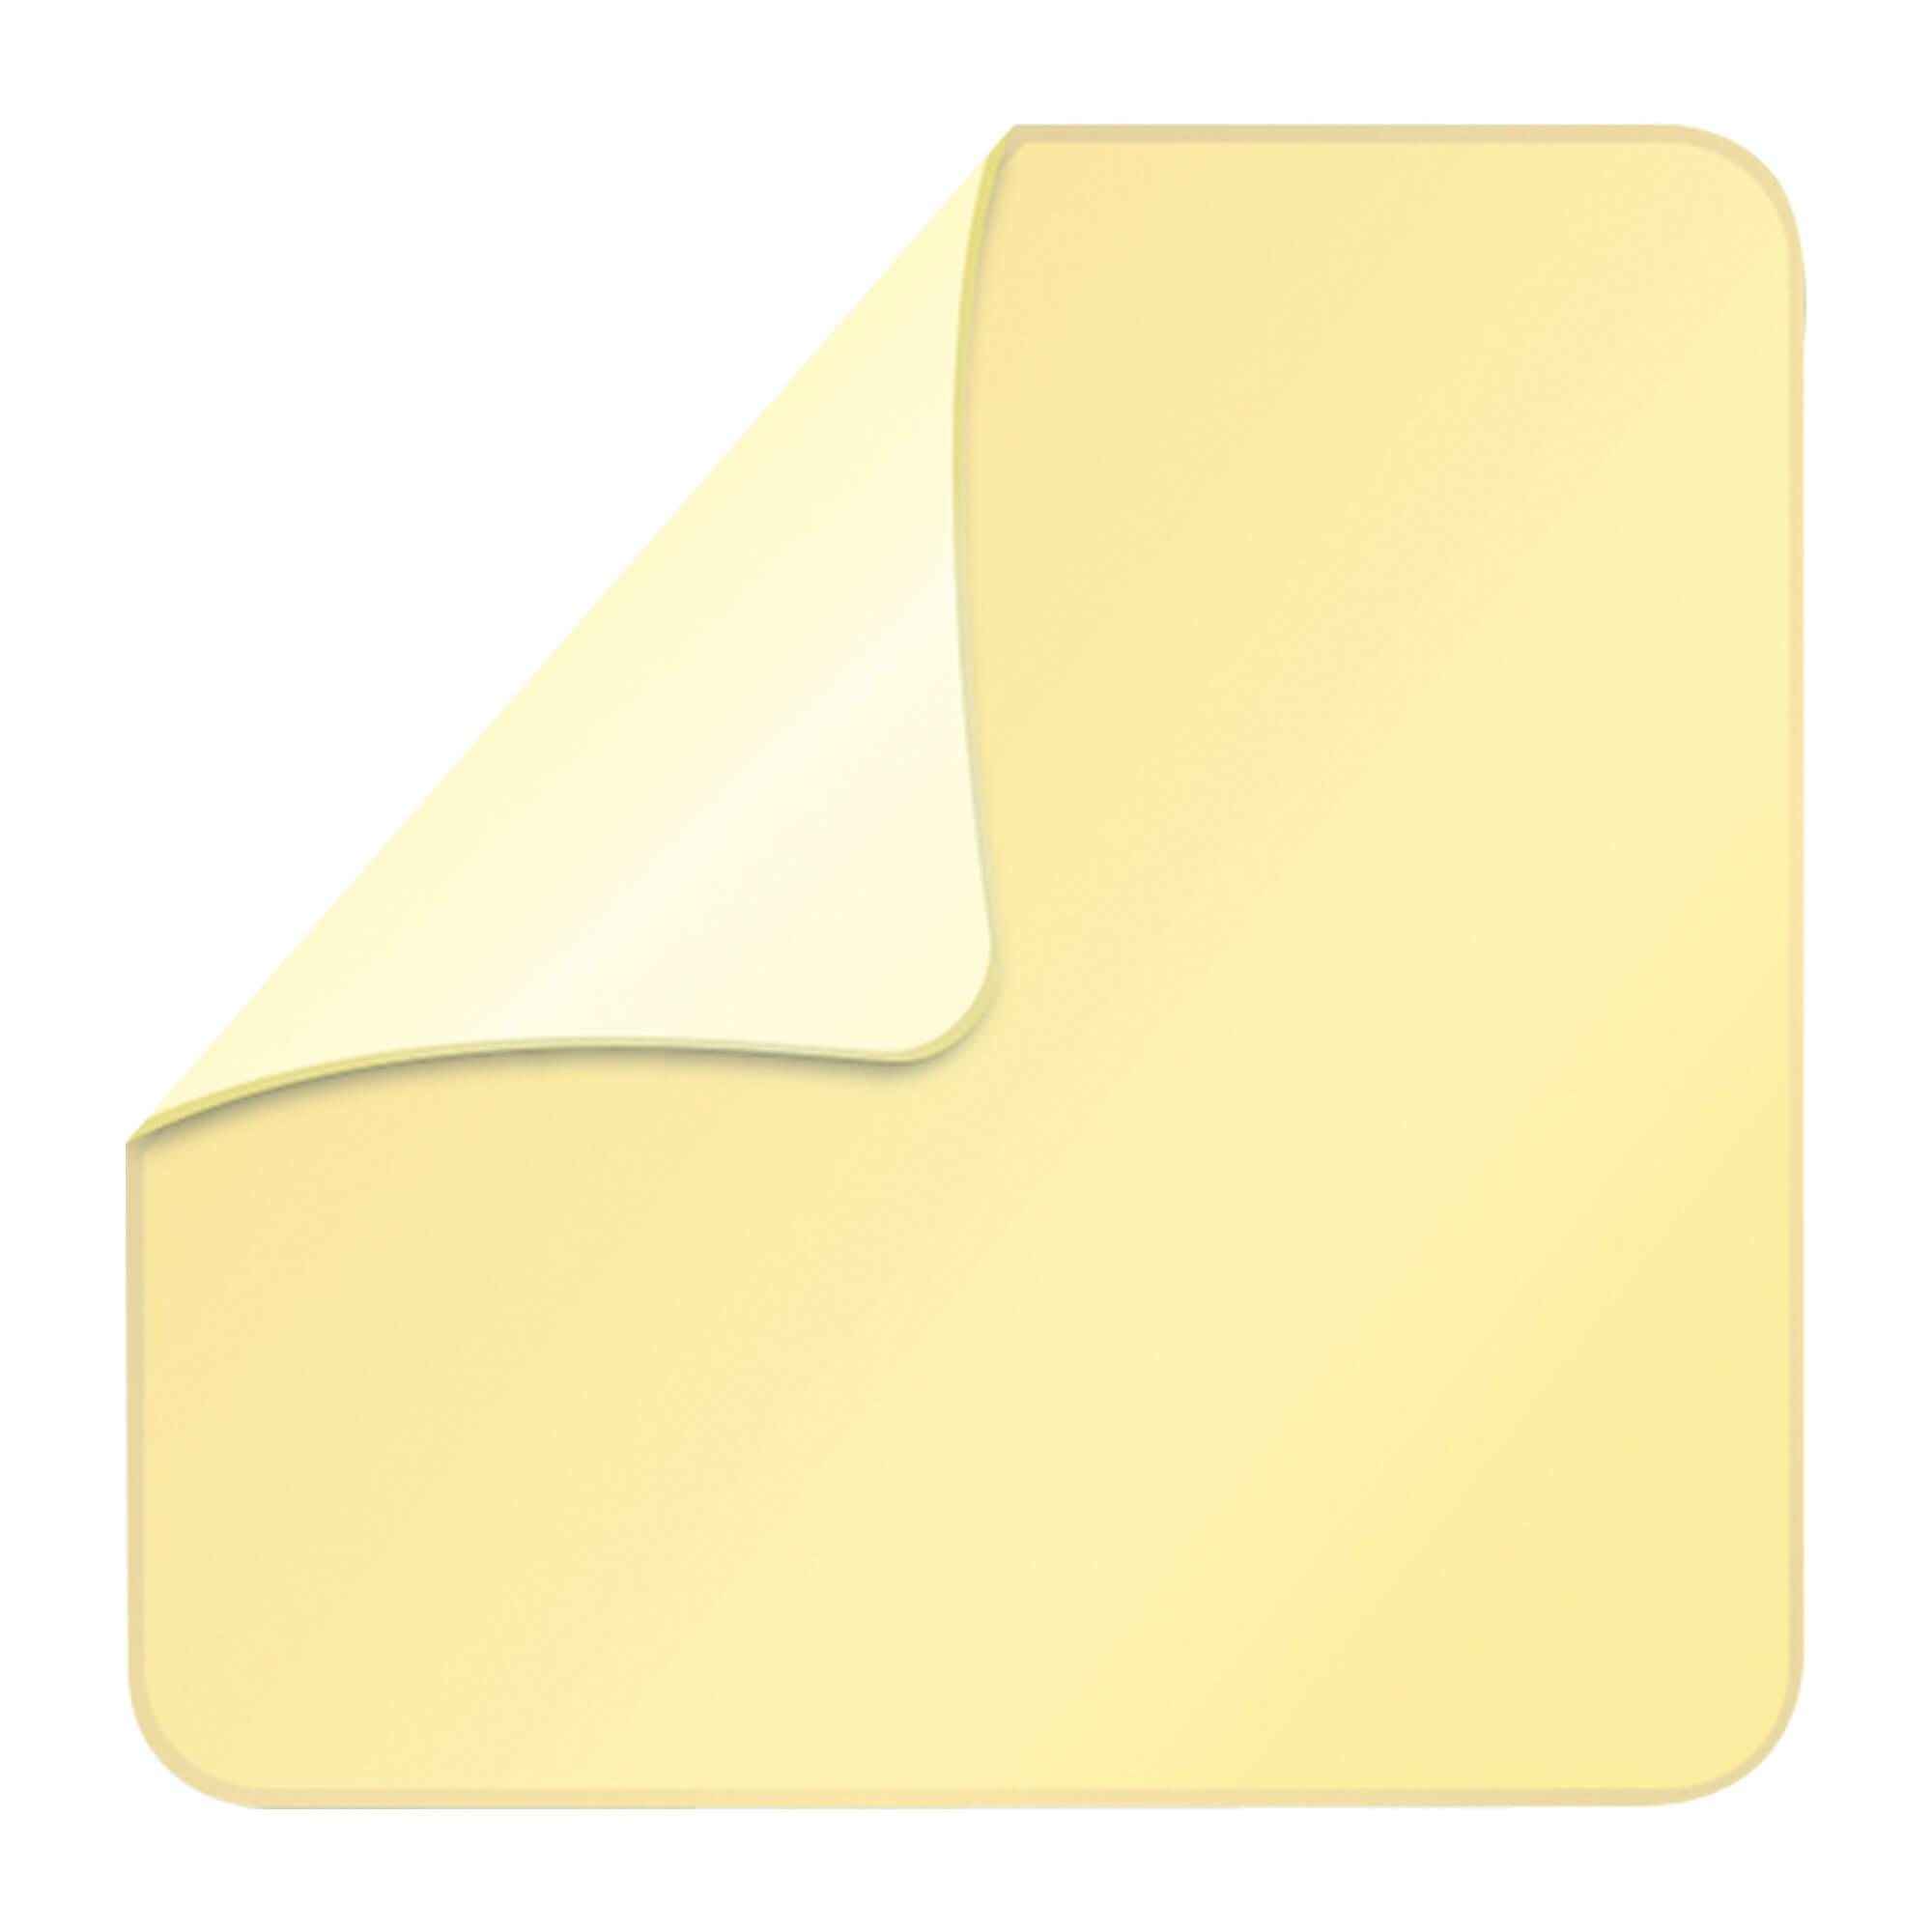 Algoplaque 20x20 cm flexibler Hydrokolloidverband